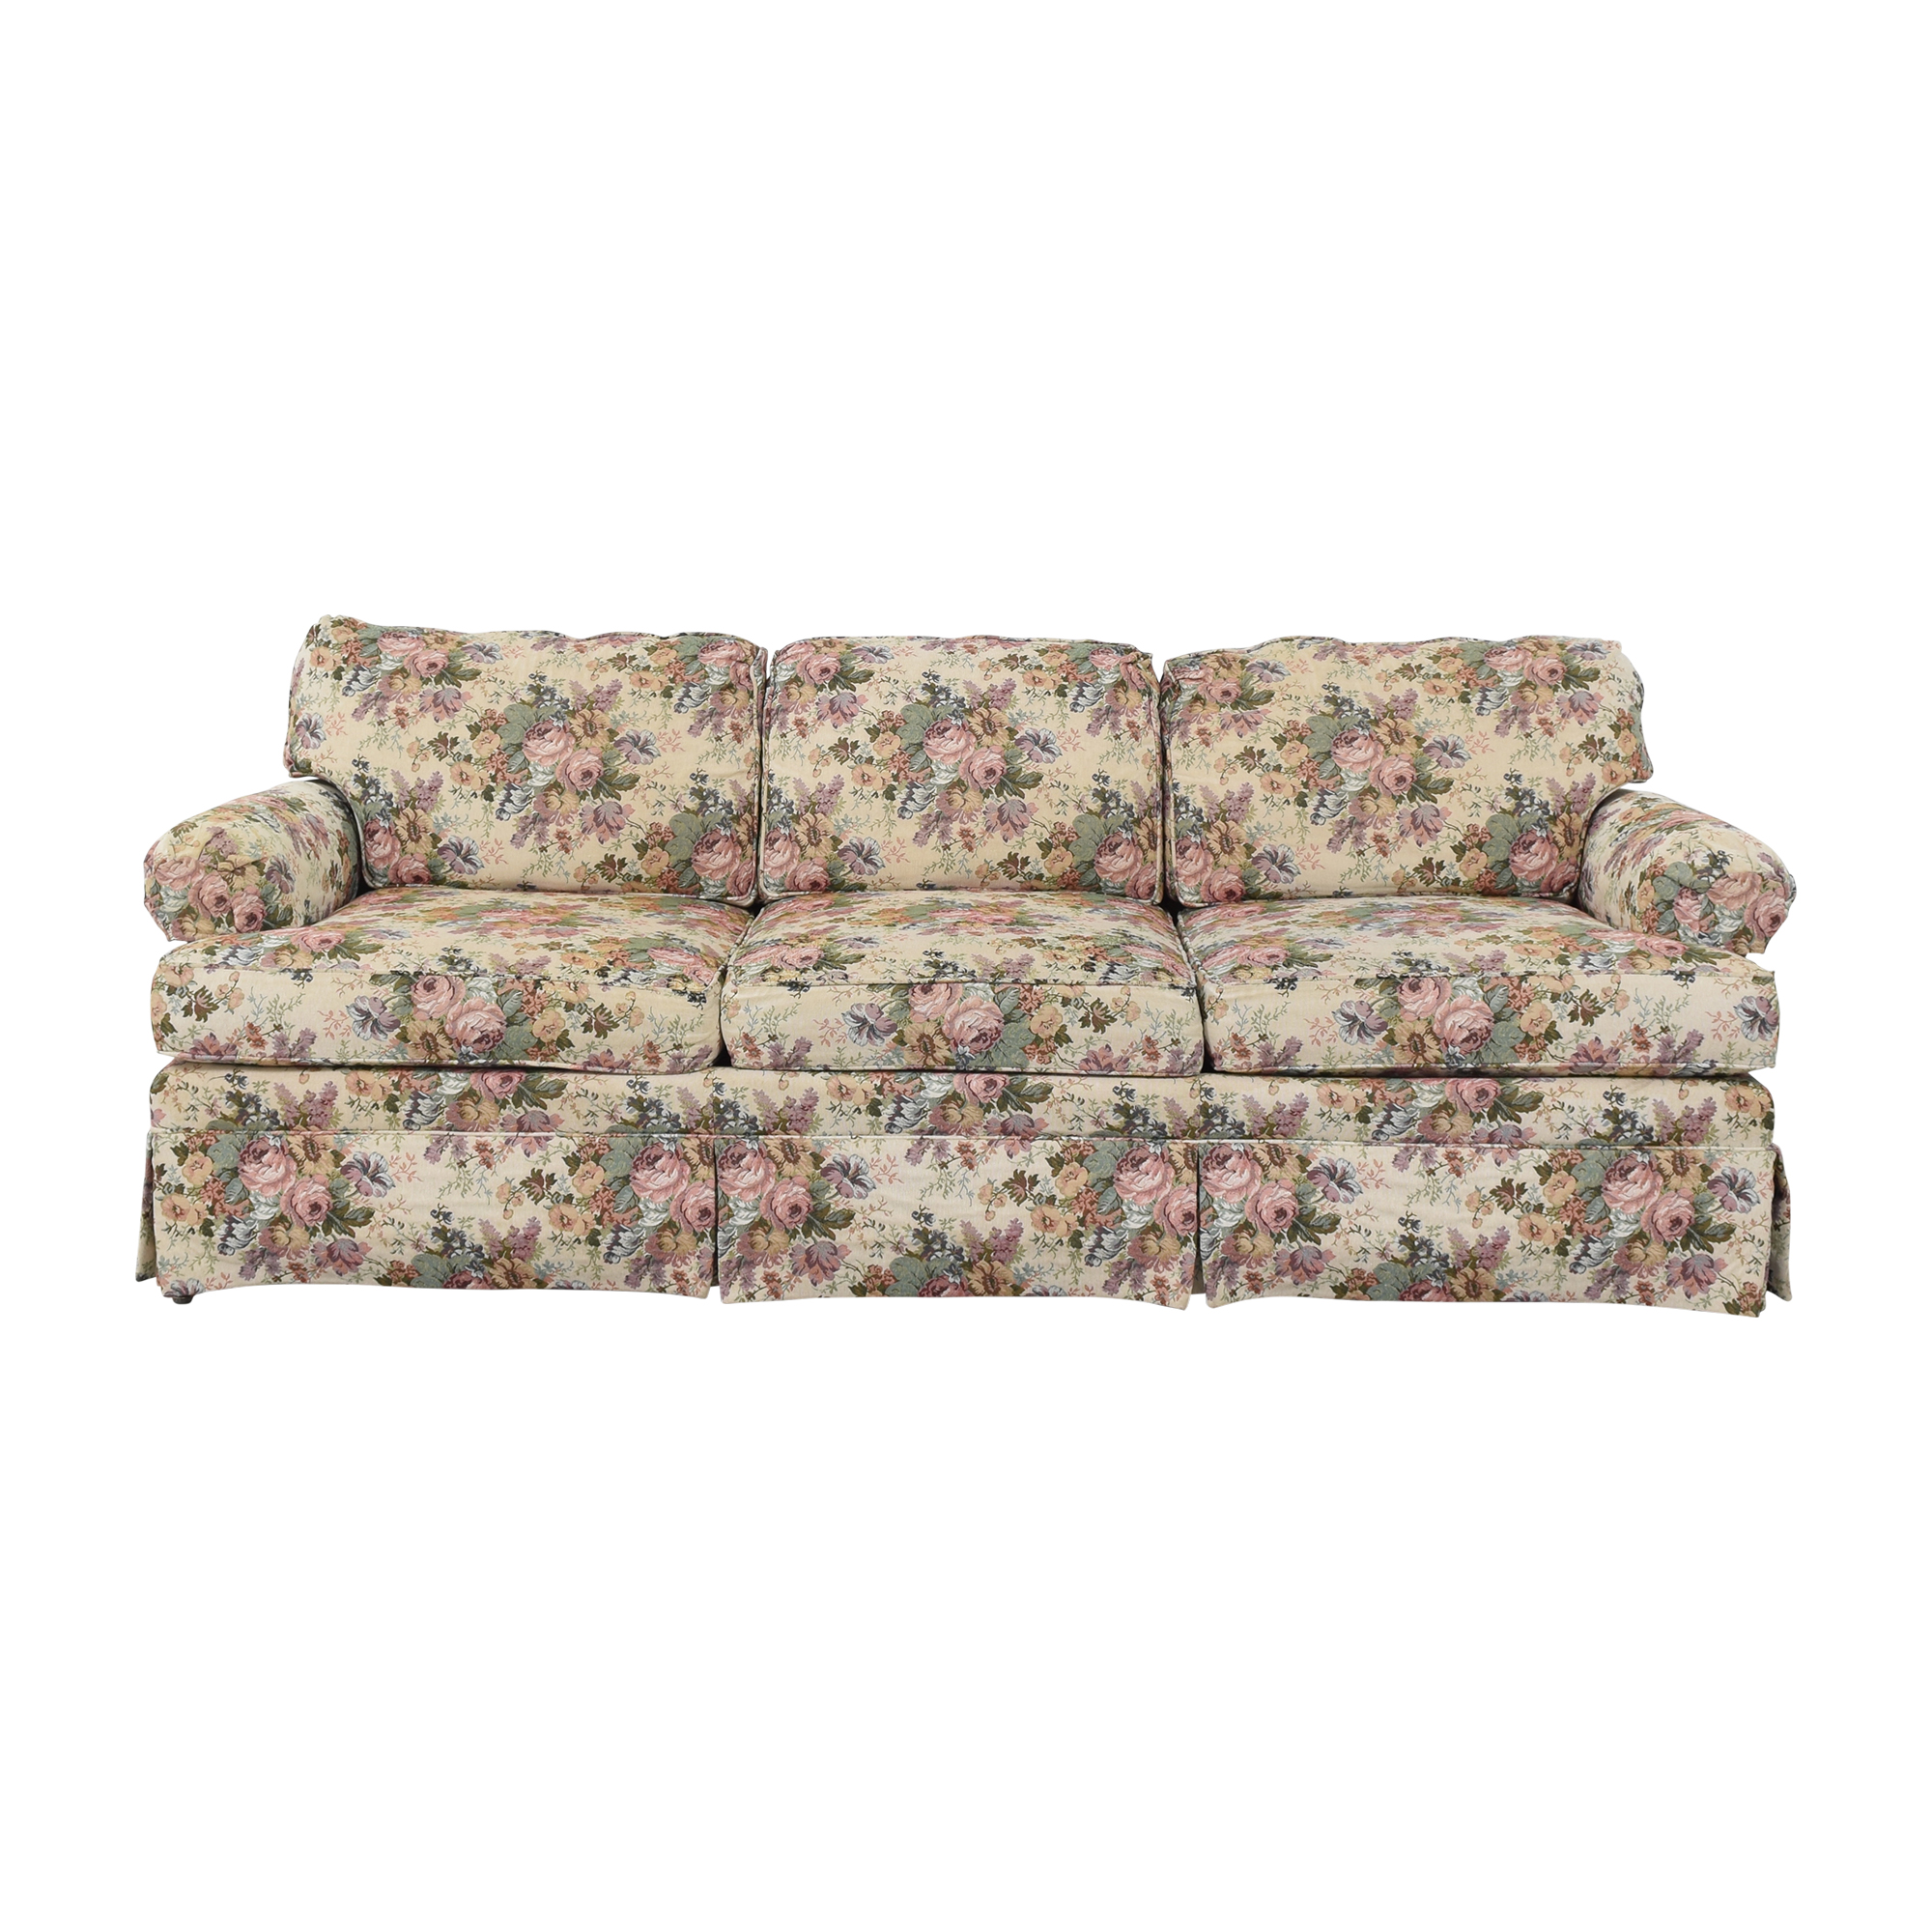 Ethan Allen Ethan Allen Tapestry Sofa on sale